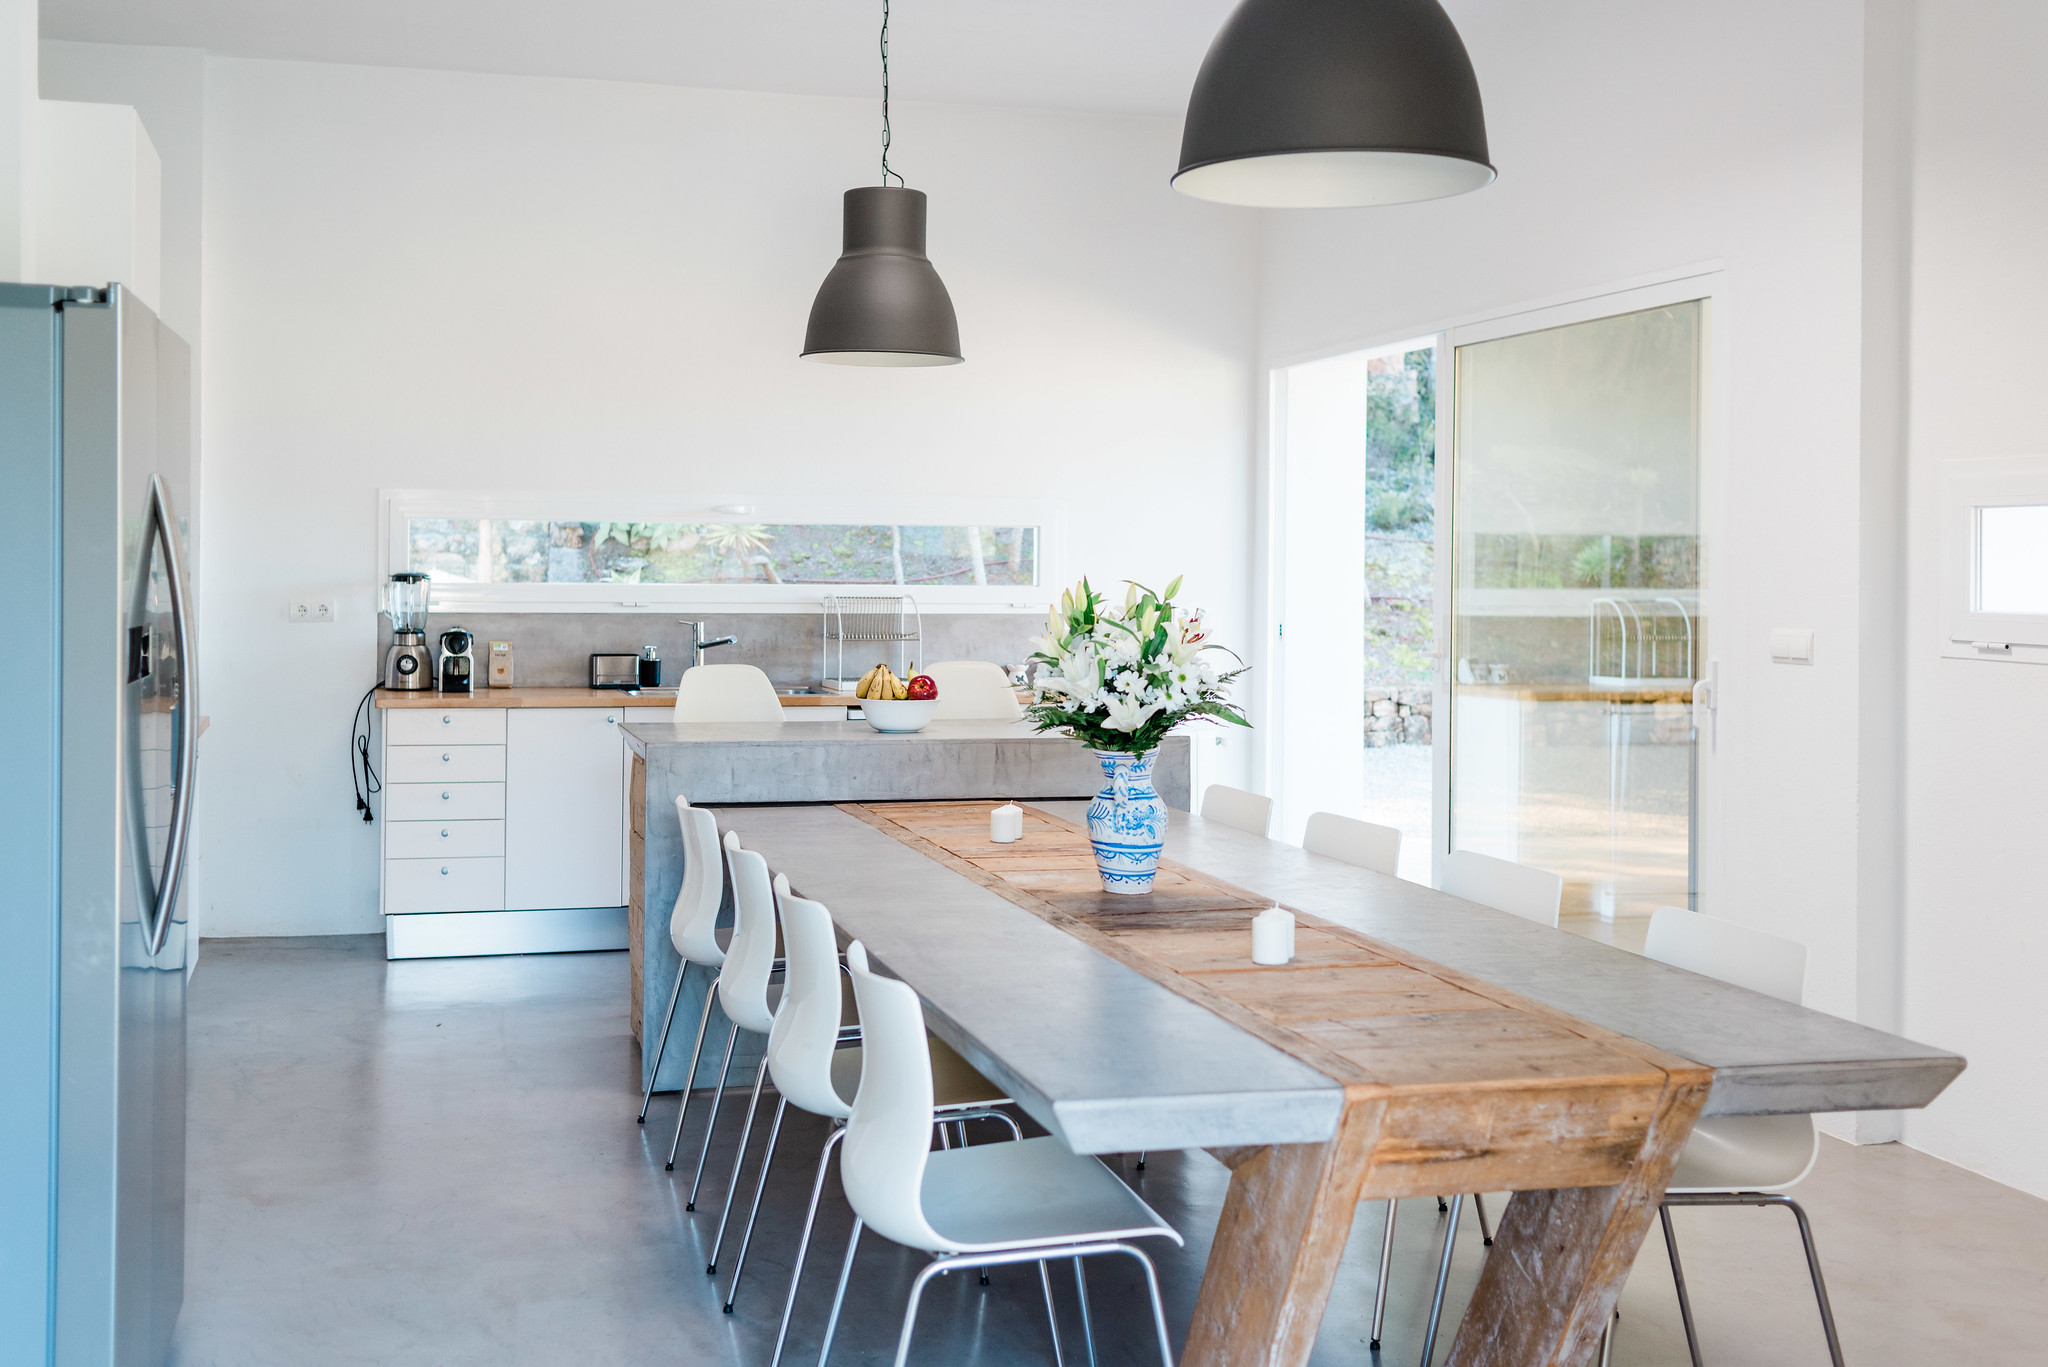 https://www.white-ibiza.com/wp-content/uploads/2020/05/white-ibiza-villas-can-verde-interior-kitchen.jpg